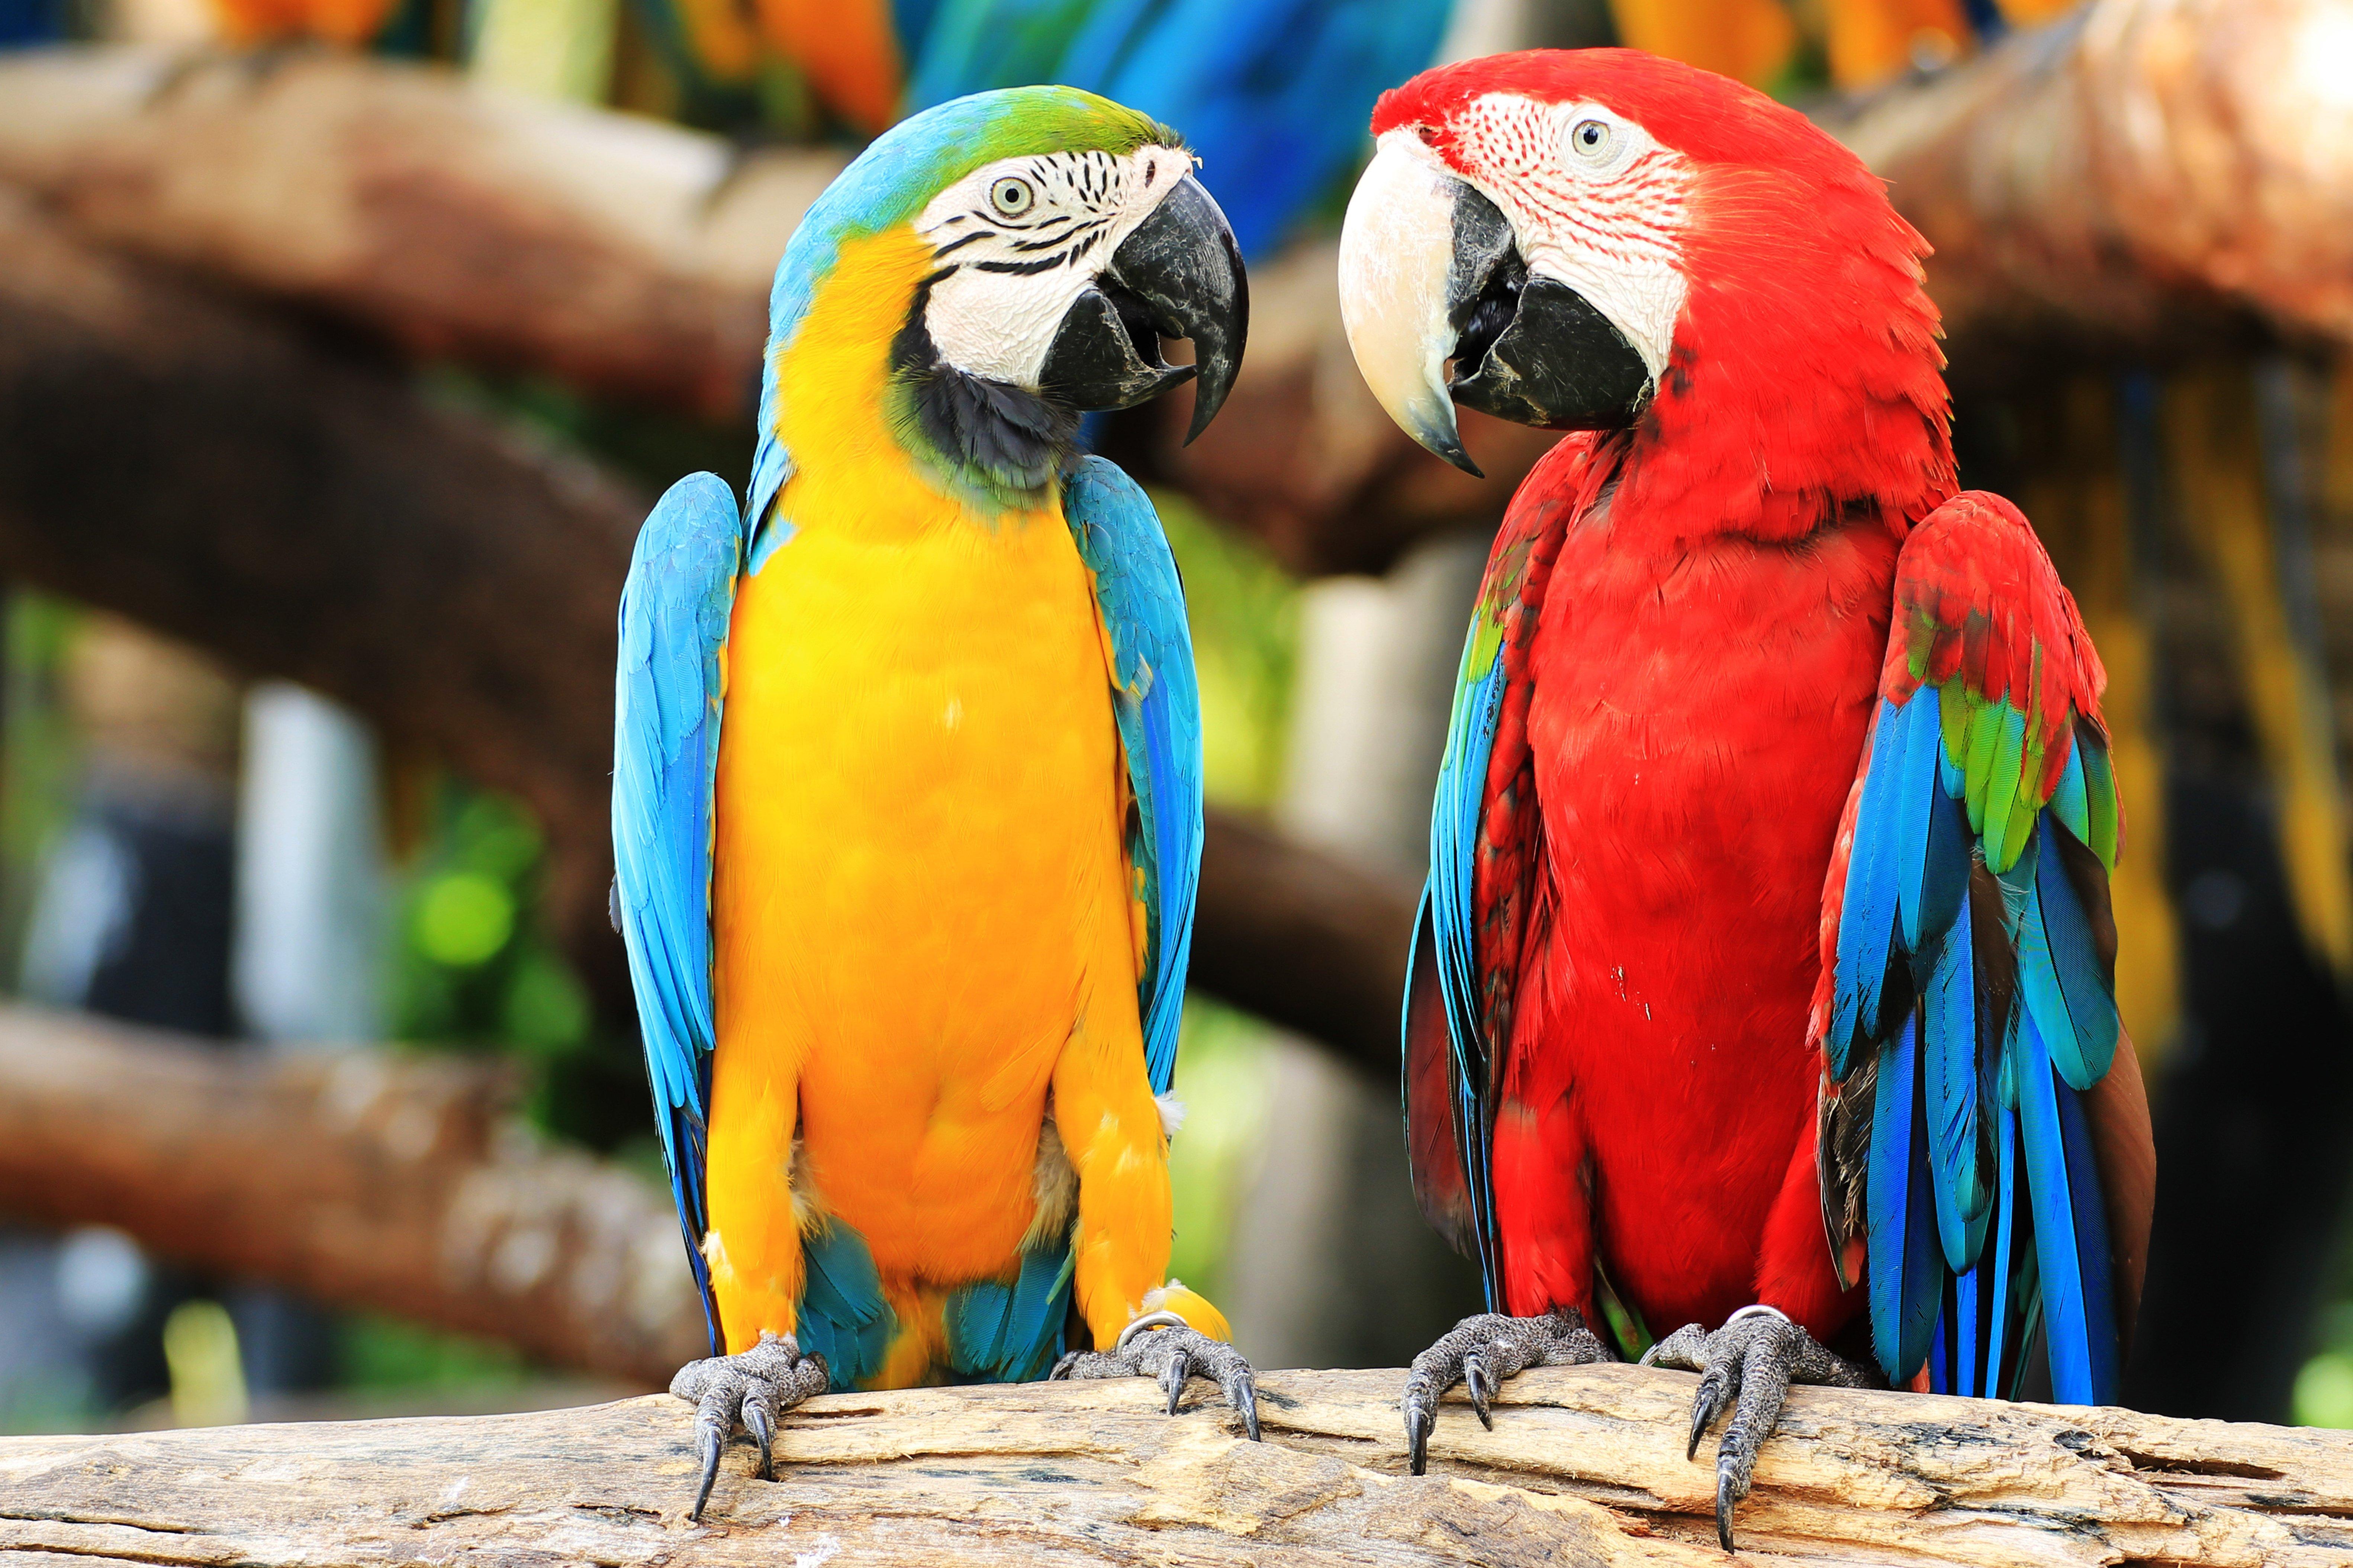 Parrot Macaw Birds Couple